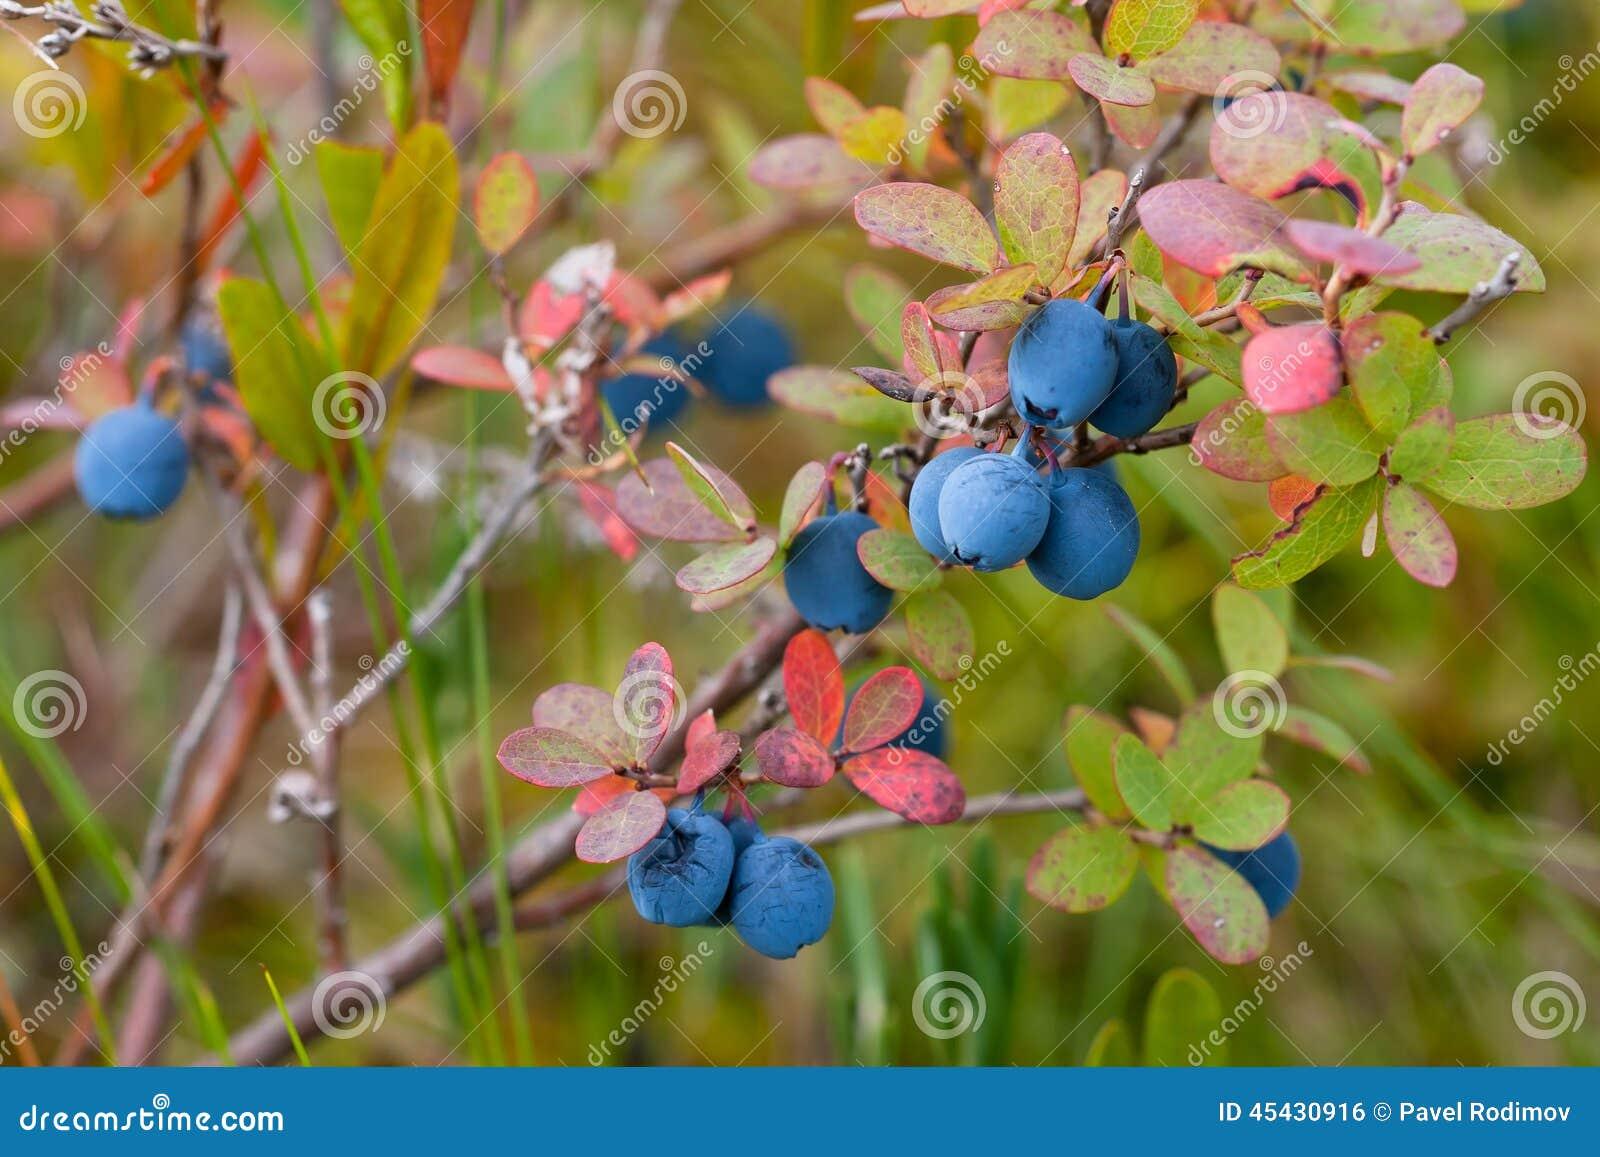 Bush of bog bilberry